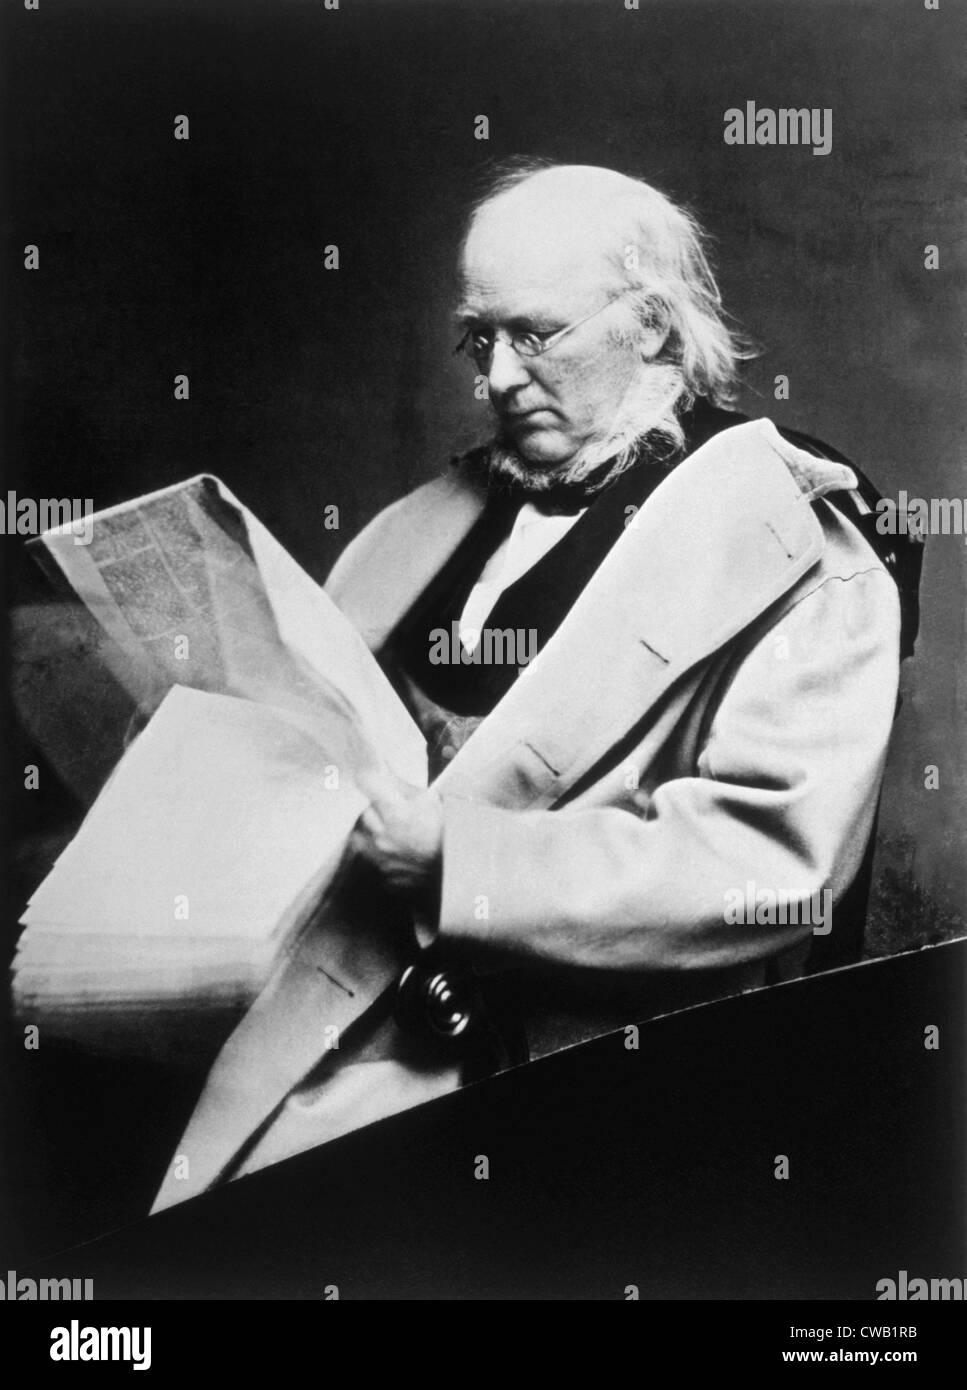 Horace Greeley (1811-1872), photograph by Mathew Brady - Stock Image